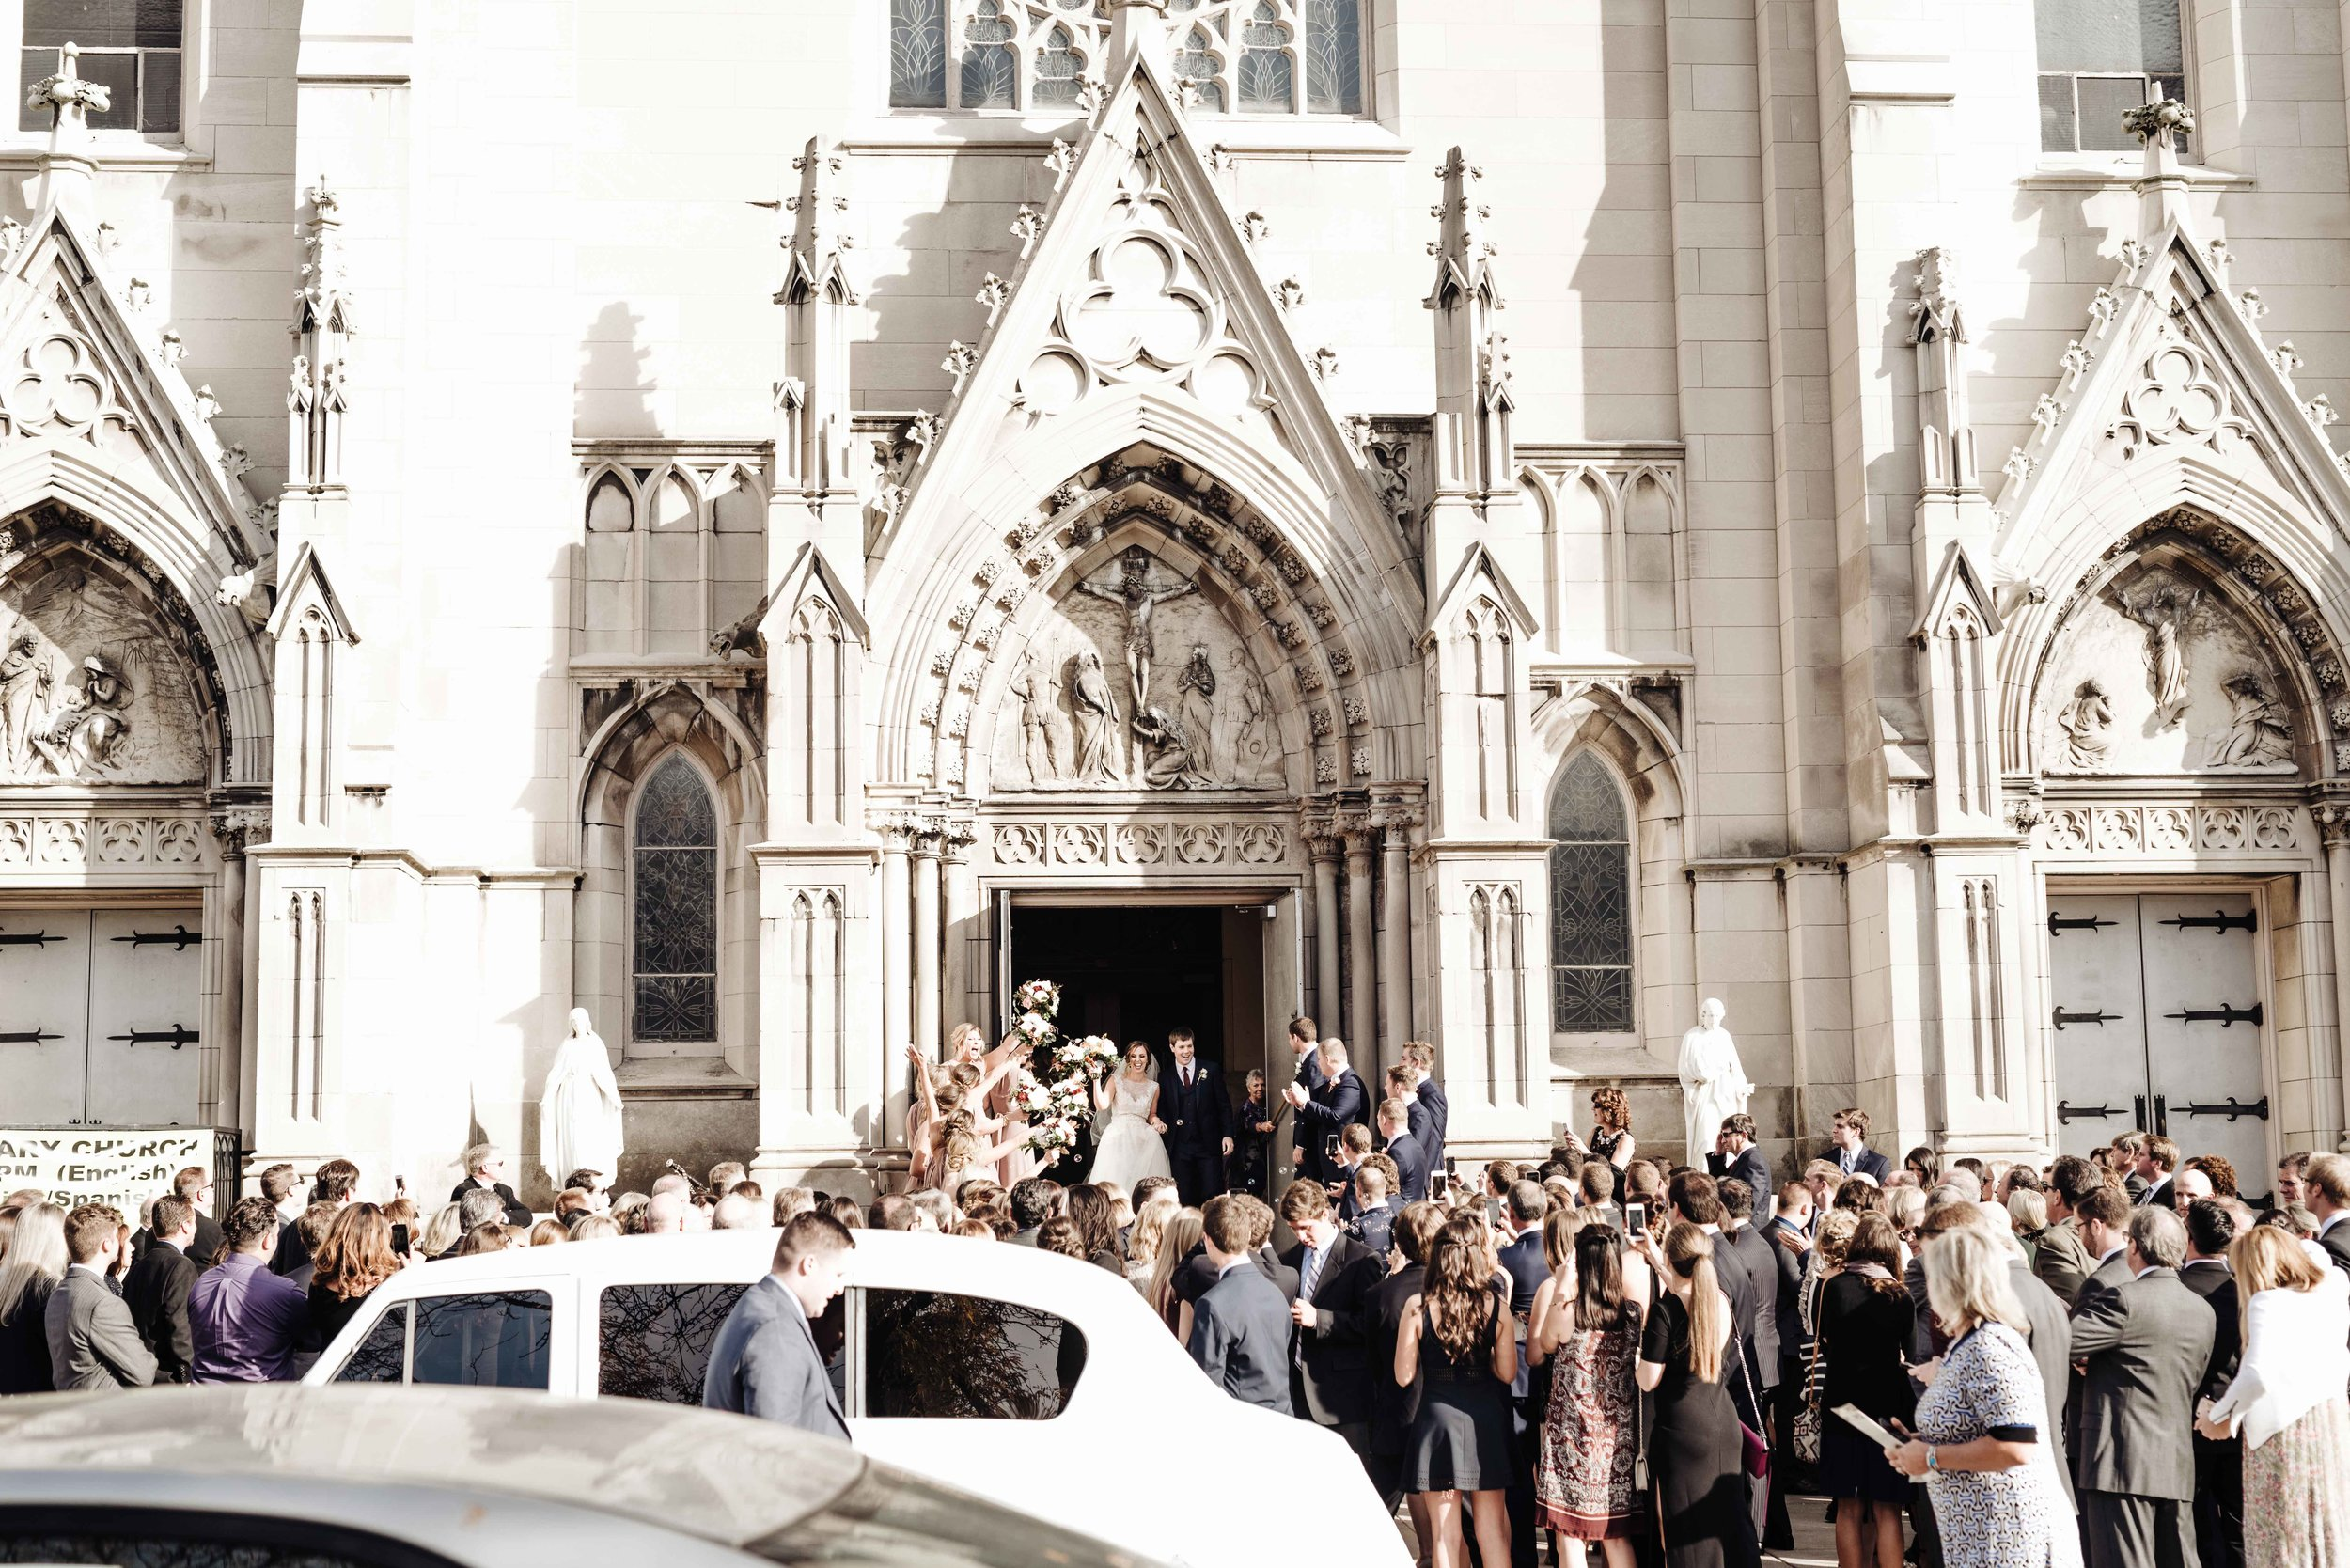 Carlee-Bob-Indianapolis-Wedding-Blog-61.jpg